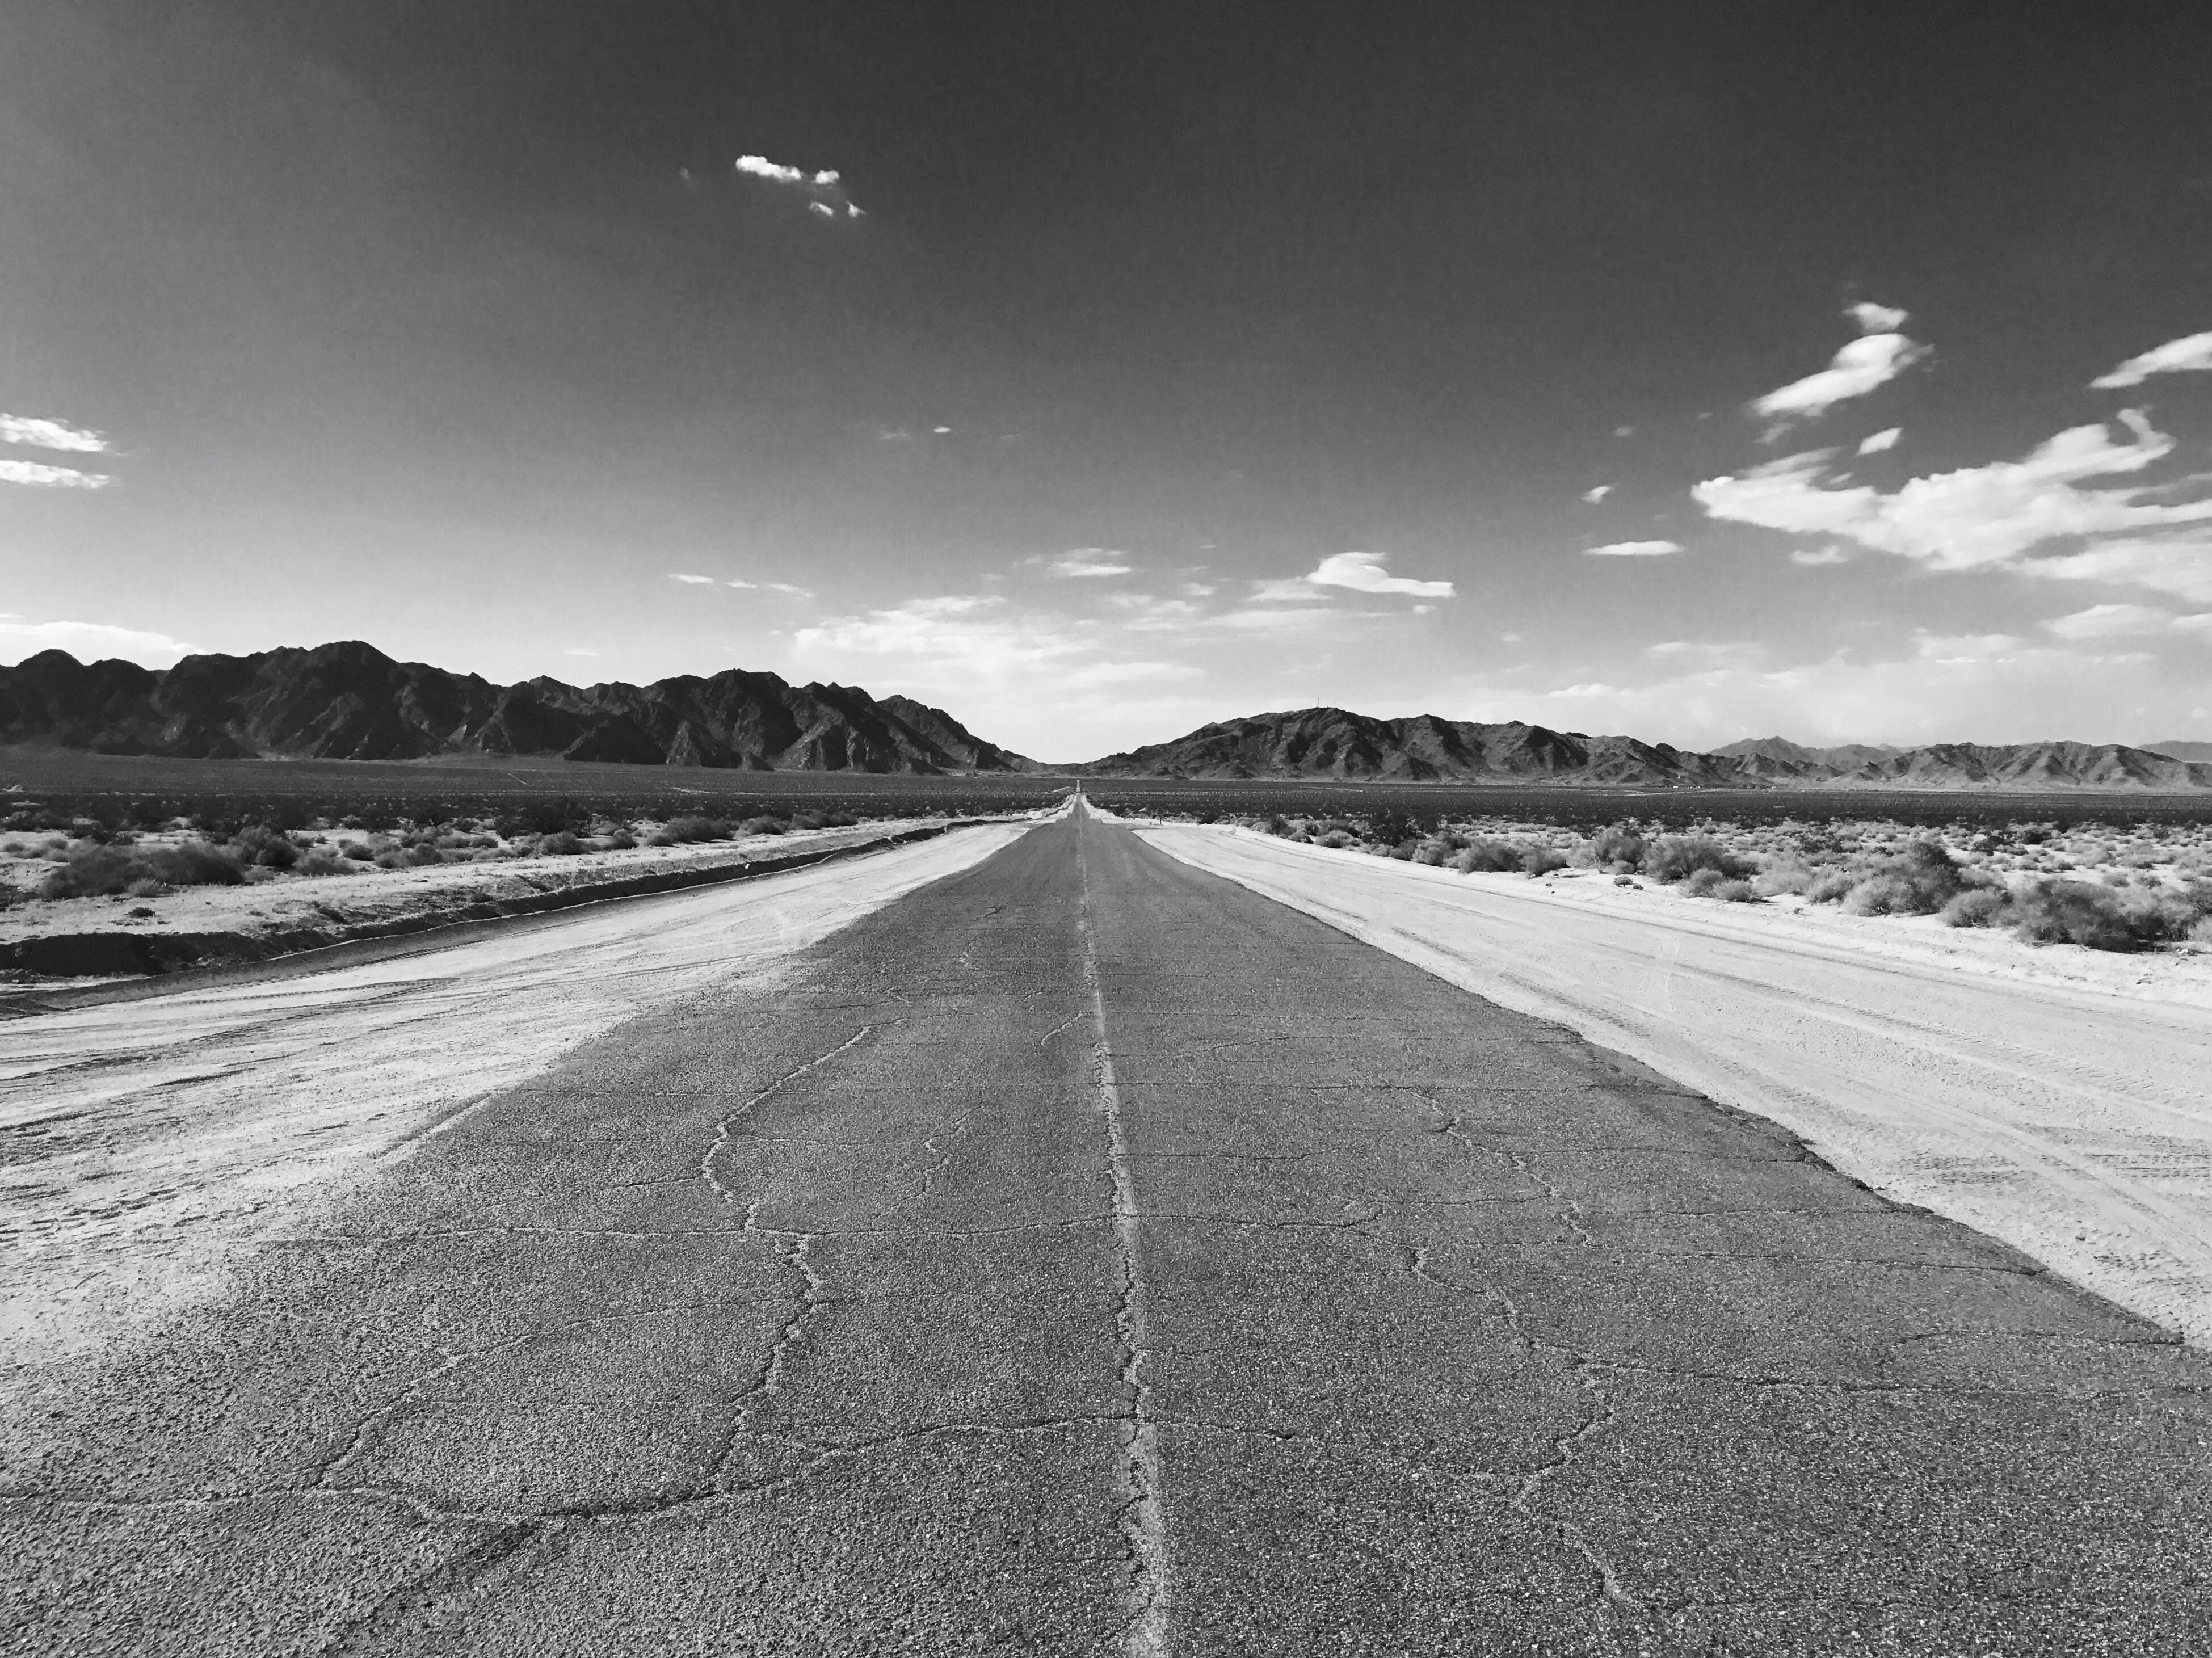 Kostenloses Stock Foto zu asphalt, autobahn, beratung, berge